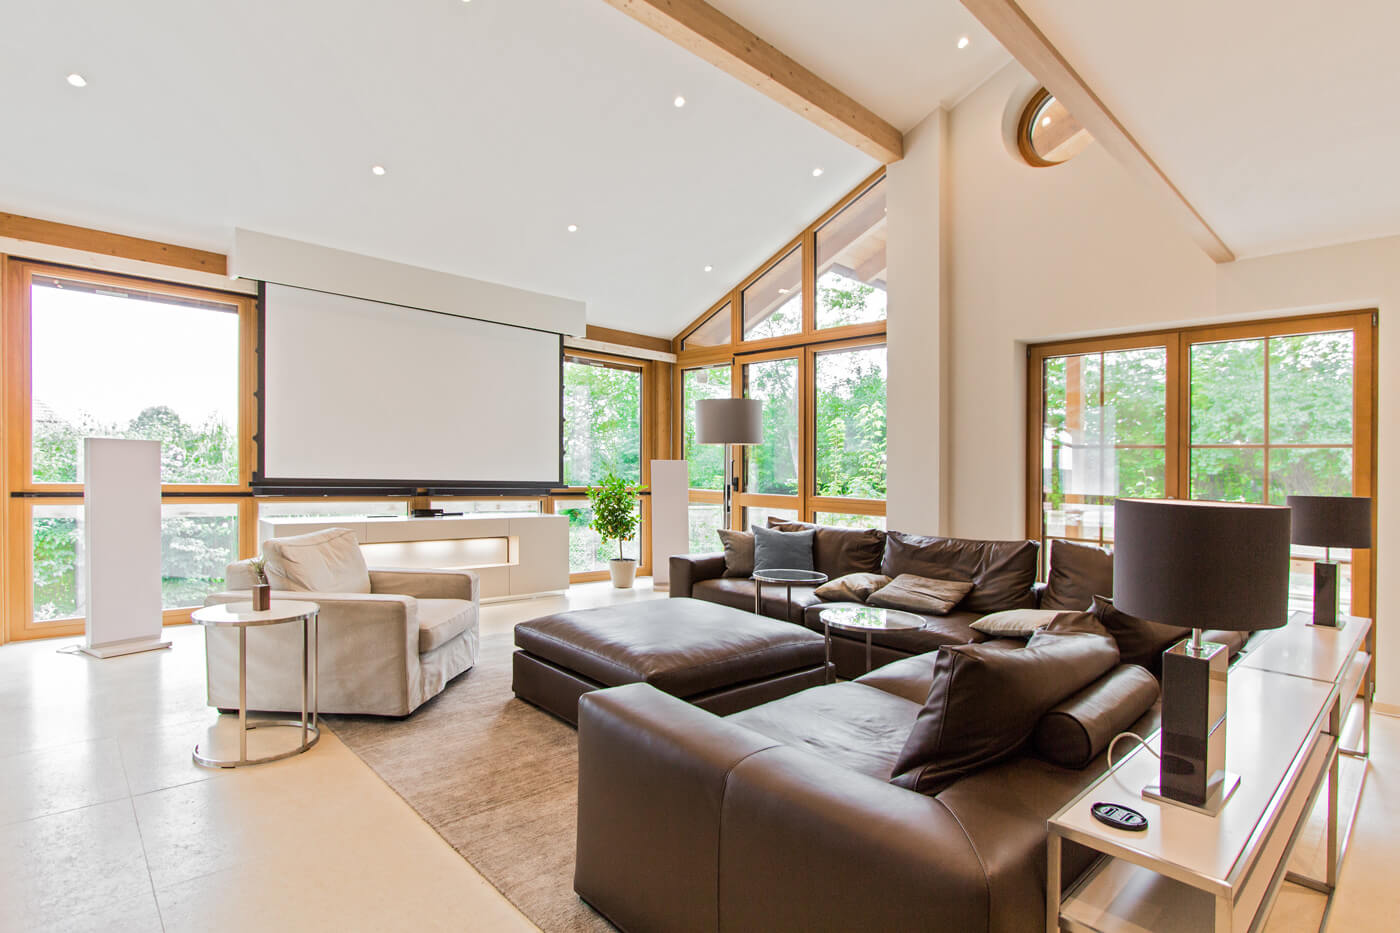 smart home villa m nchen casaio. Black Bedroom Furniture Sets. Home Design Ideas